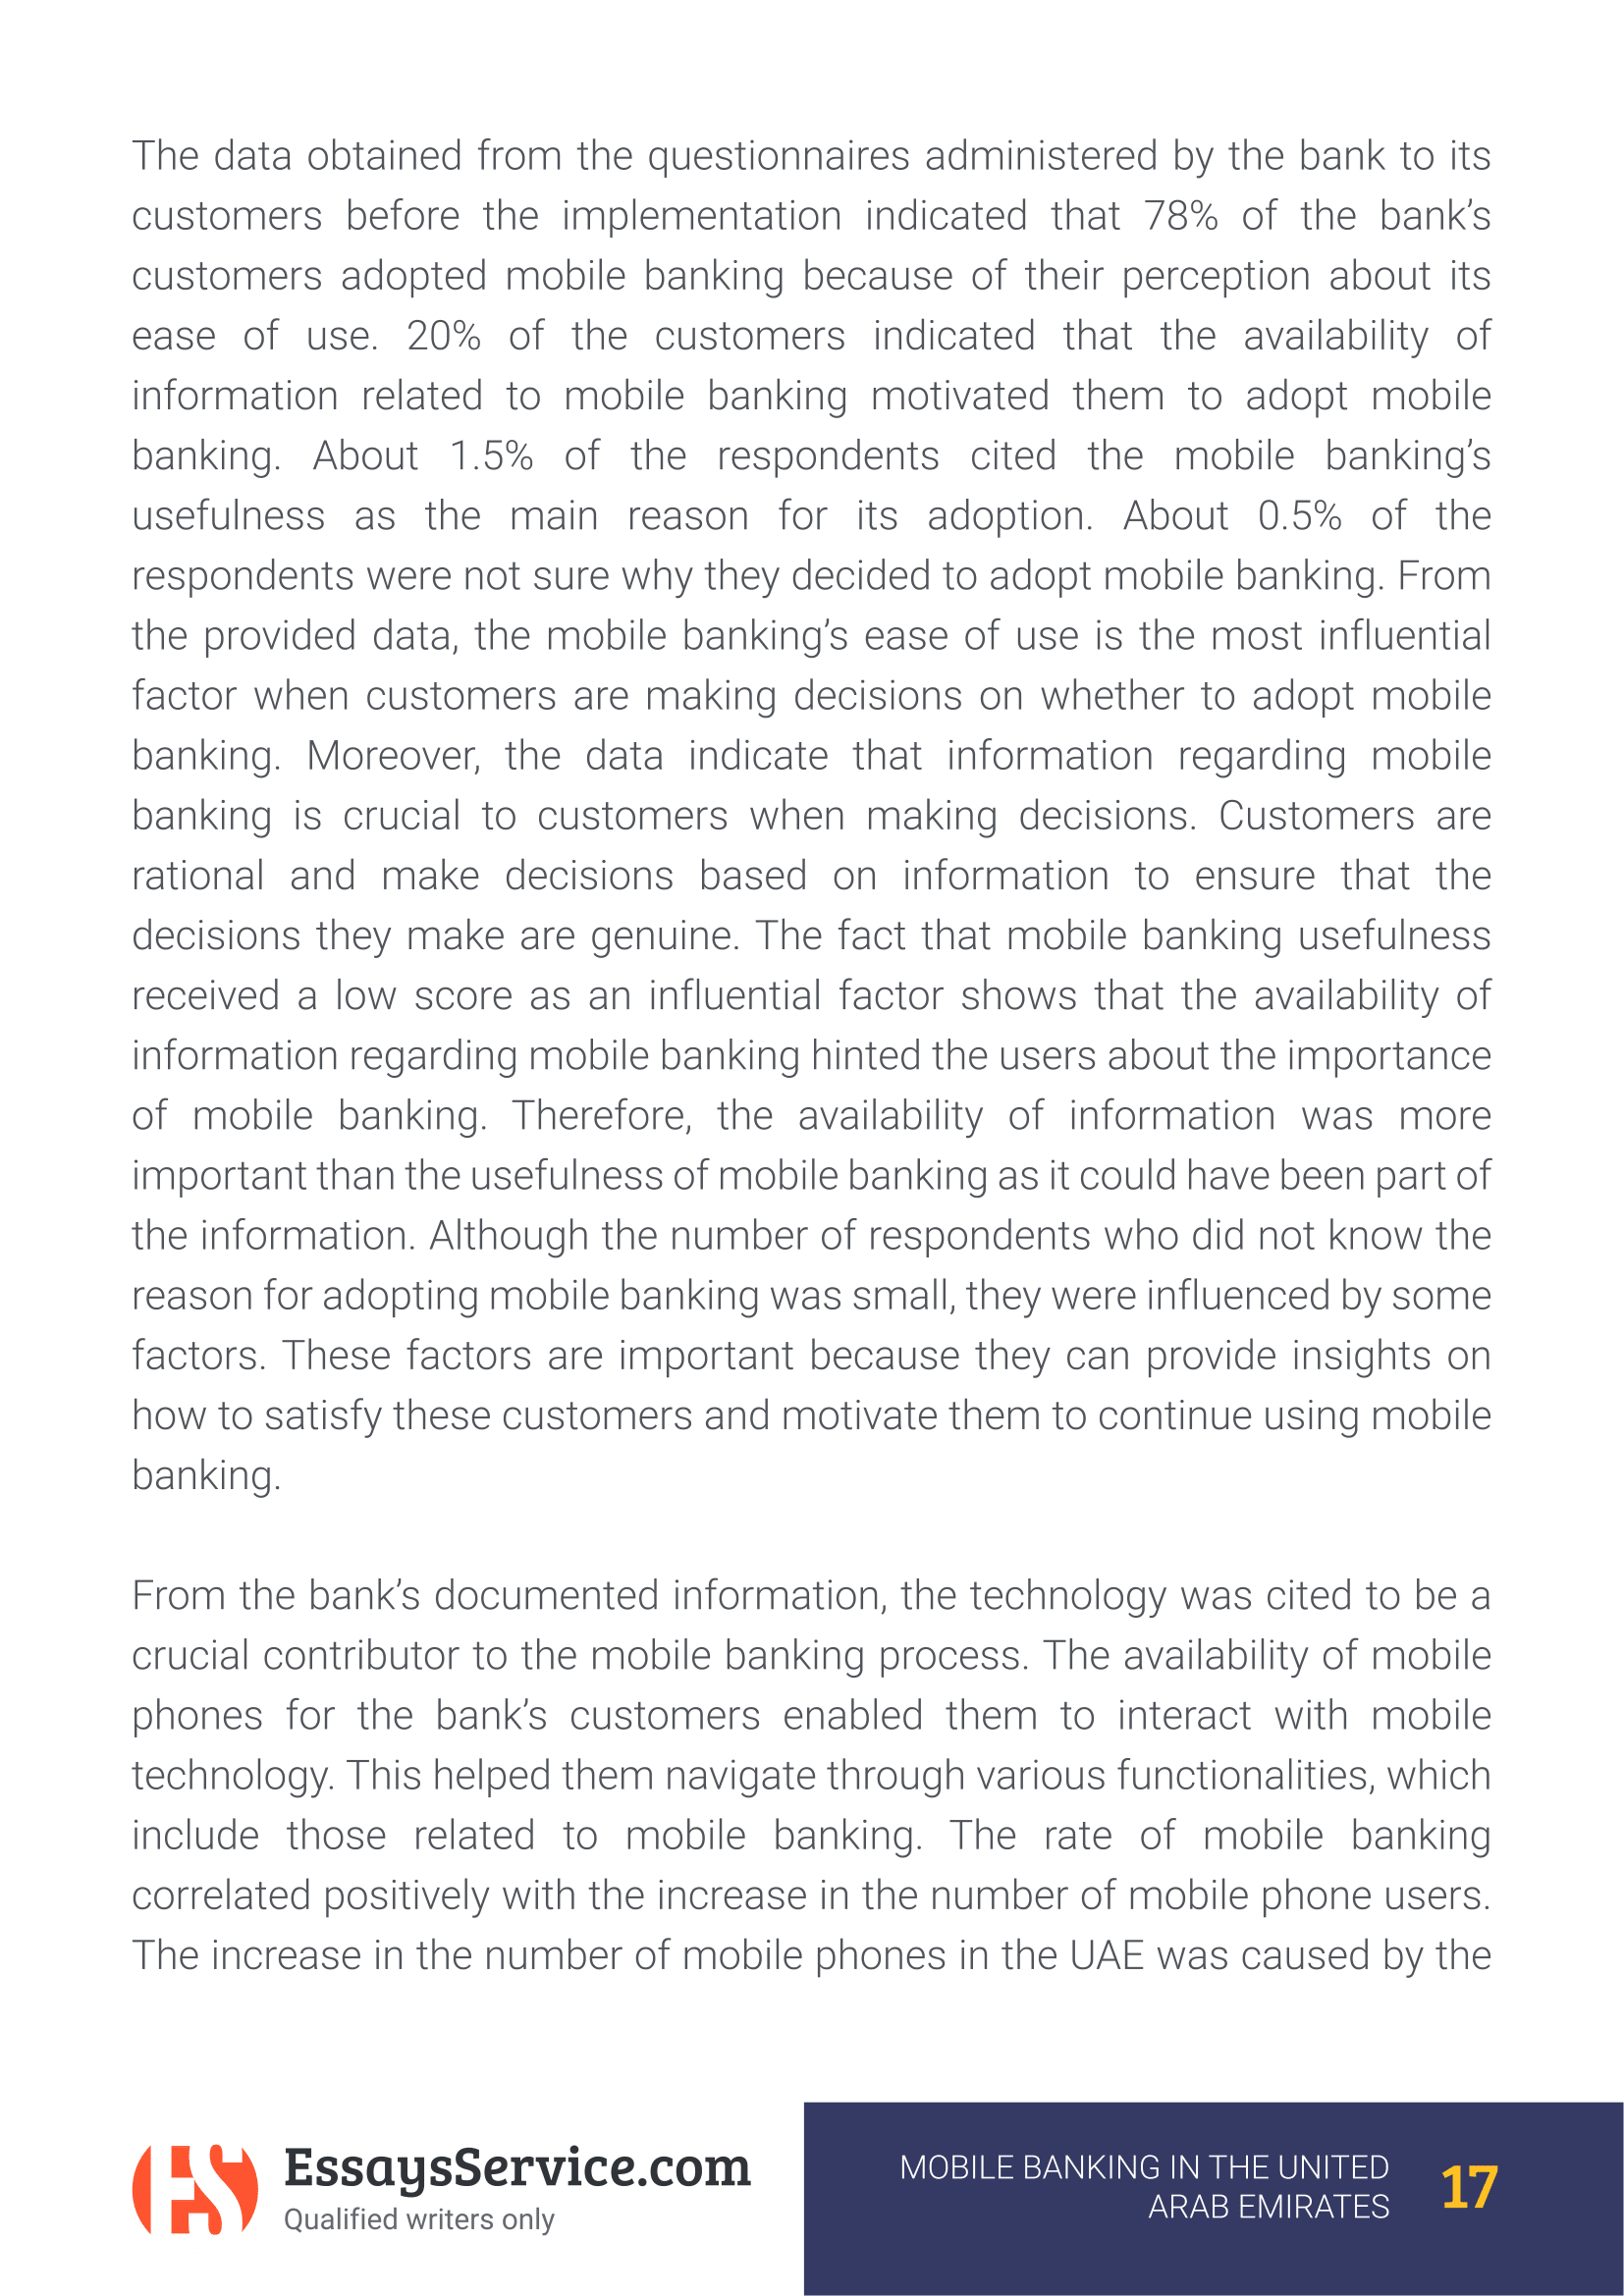 Proforma of dissertation